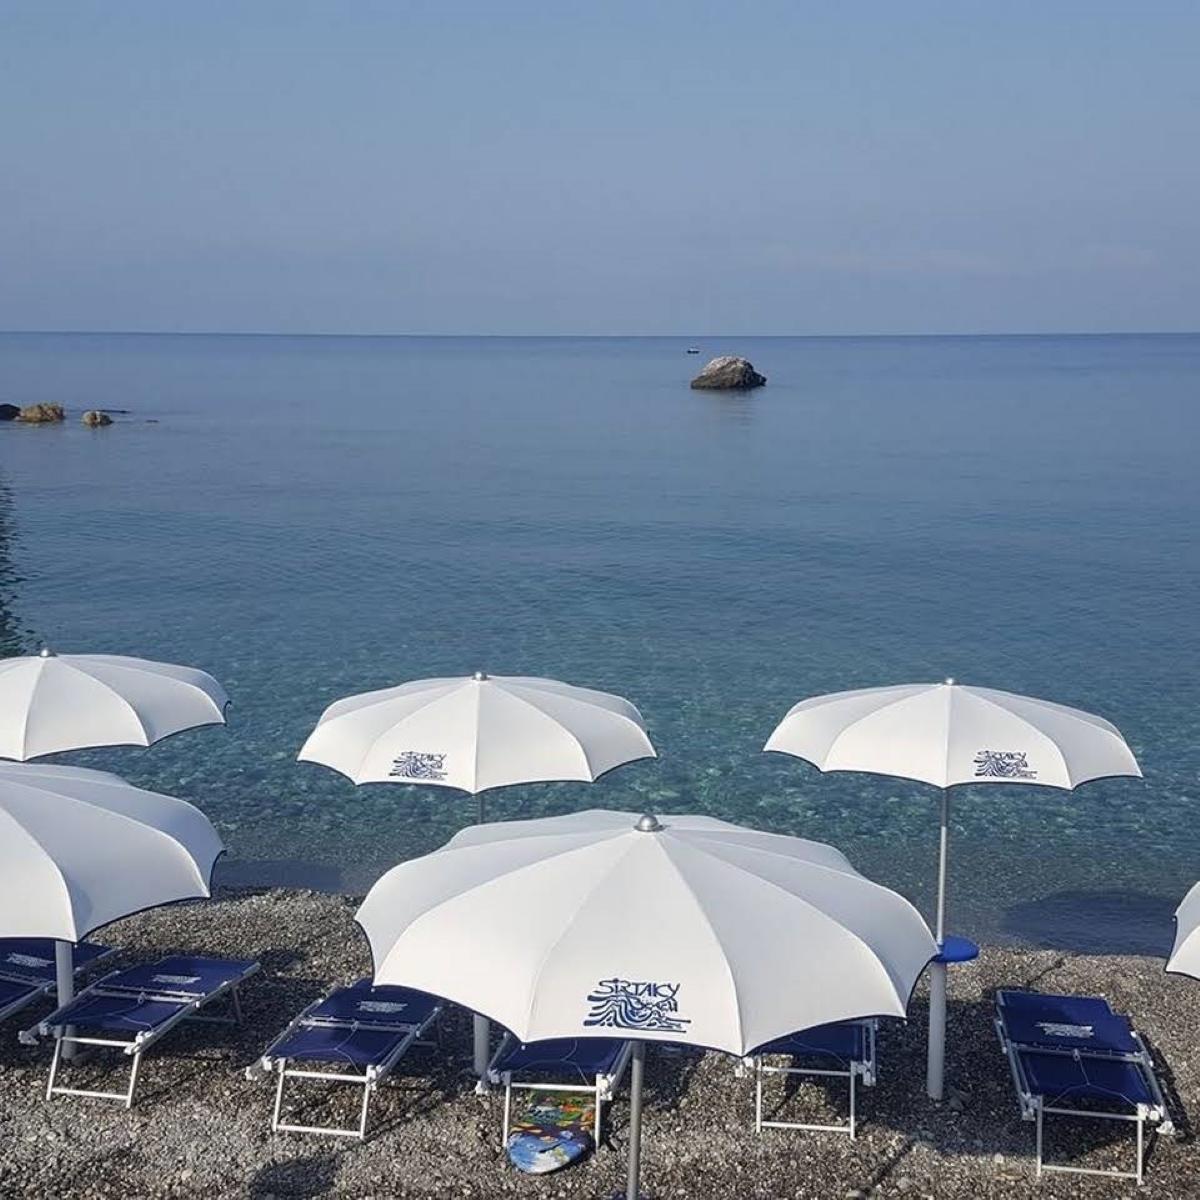 Lido Sirtaky Beach